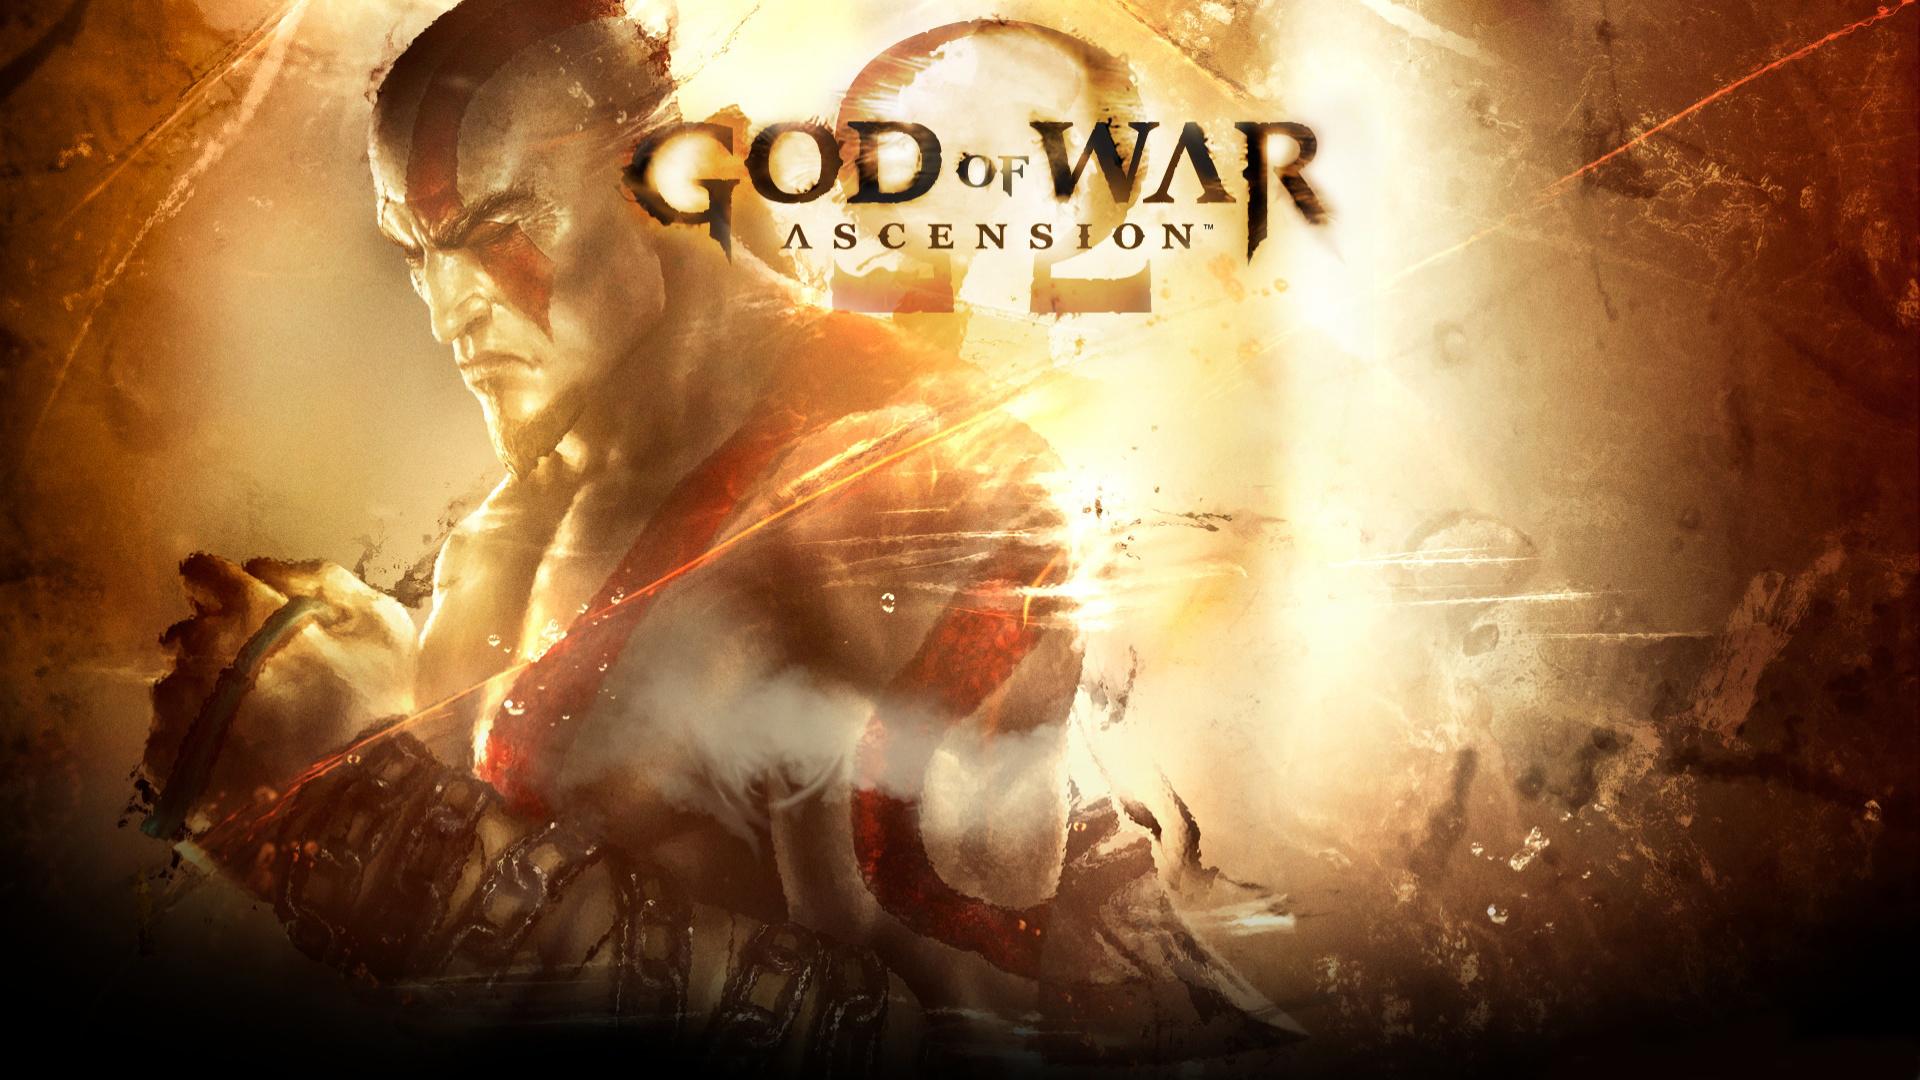 God of war ascension full hd wallpaper and background image video game god of war ascension wallpaper voltagebd Choice Image